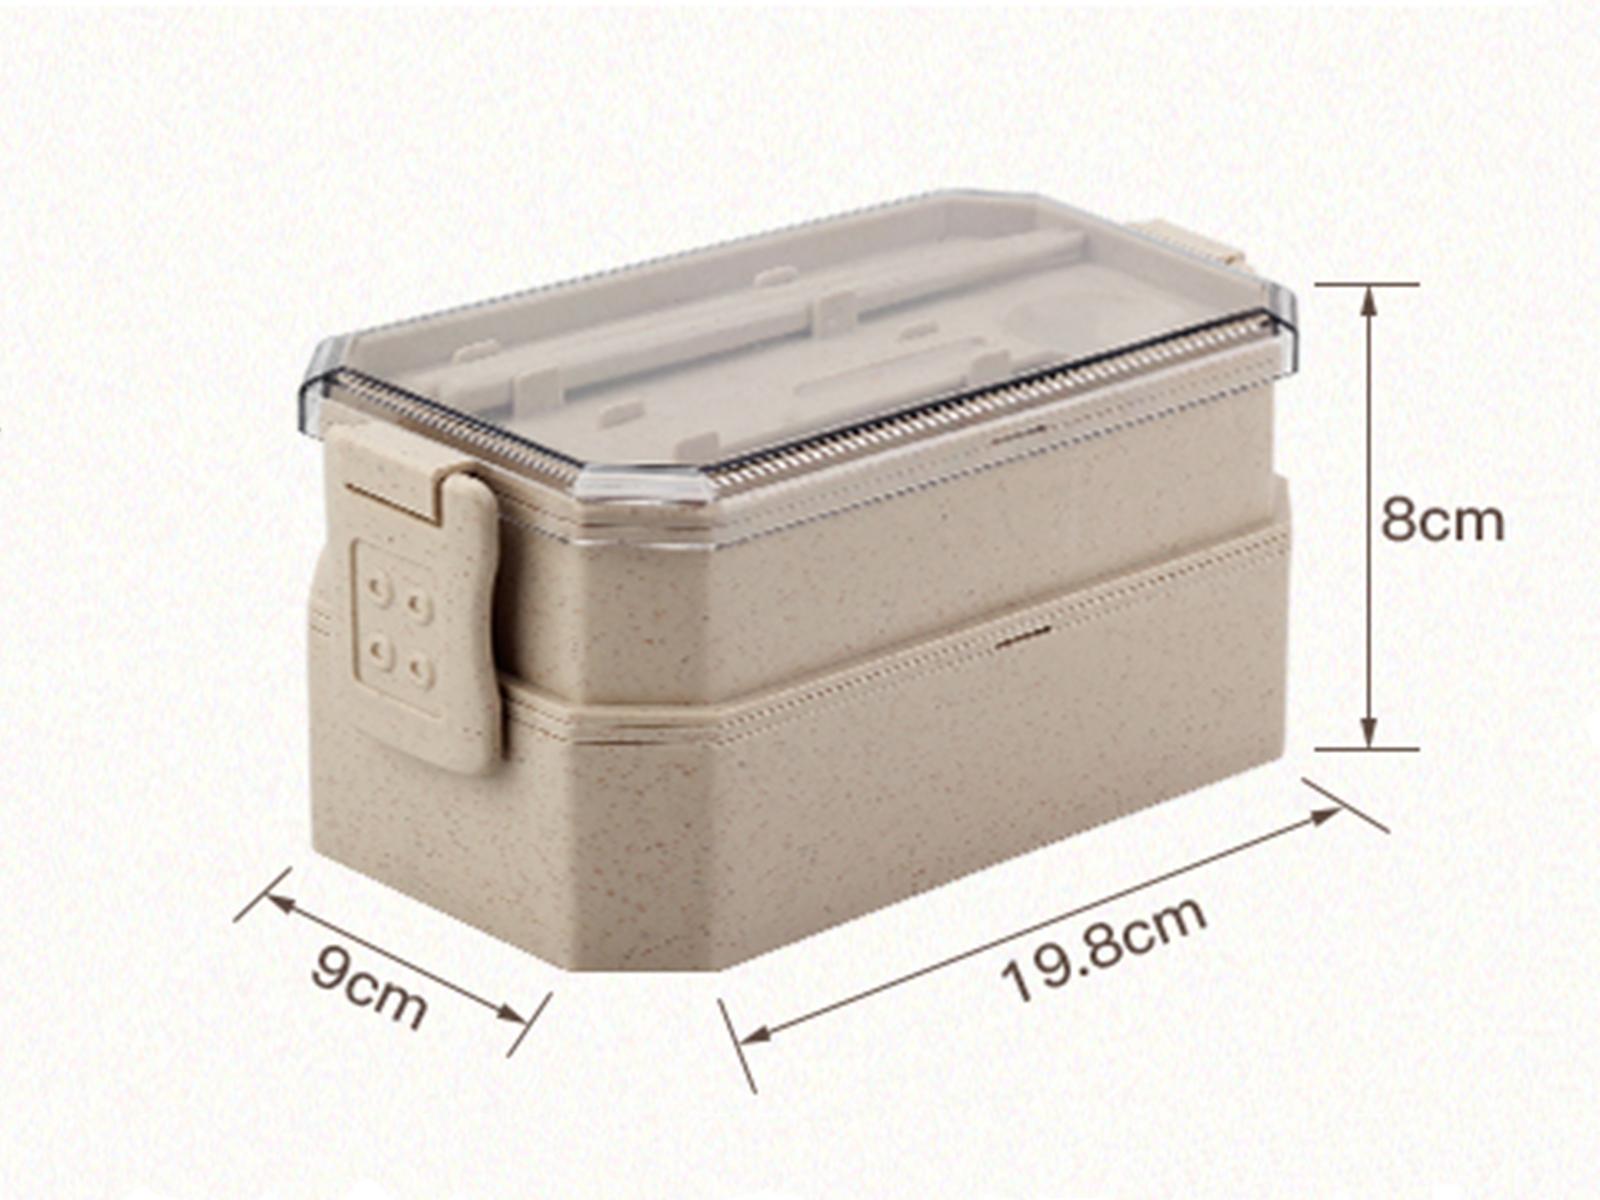 Customwheat fibre lunch box